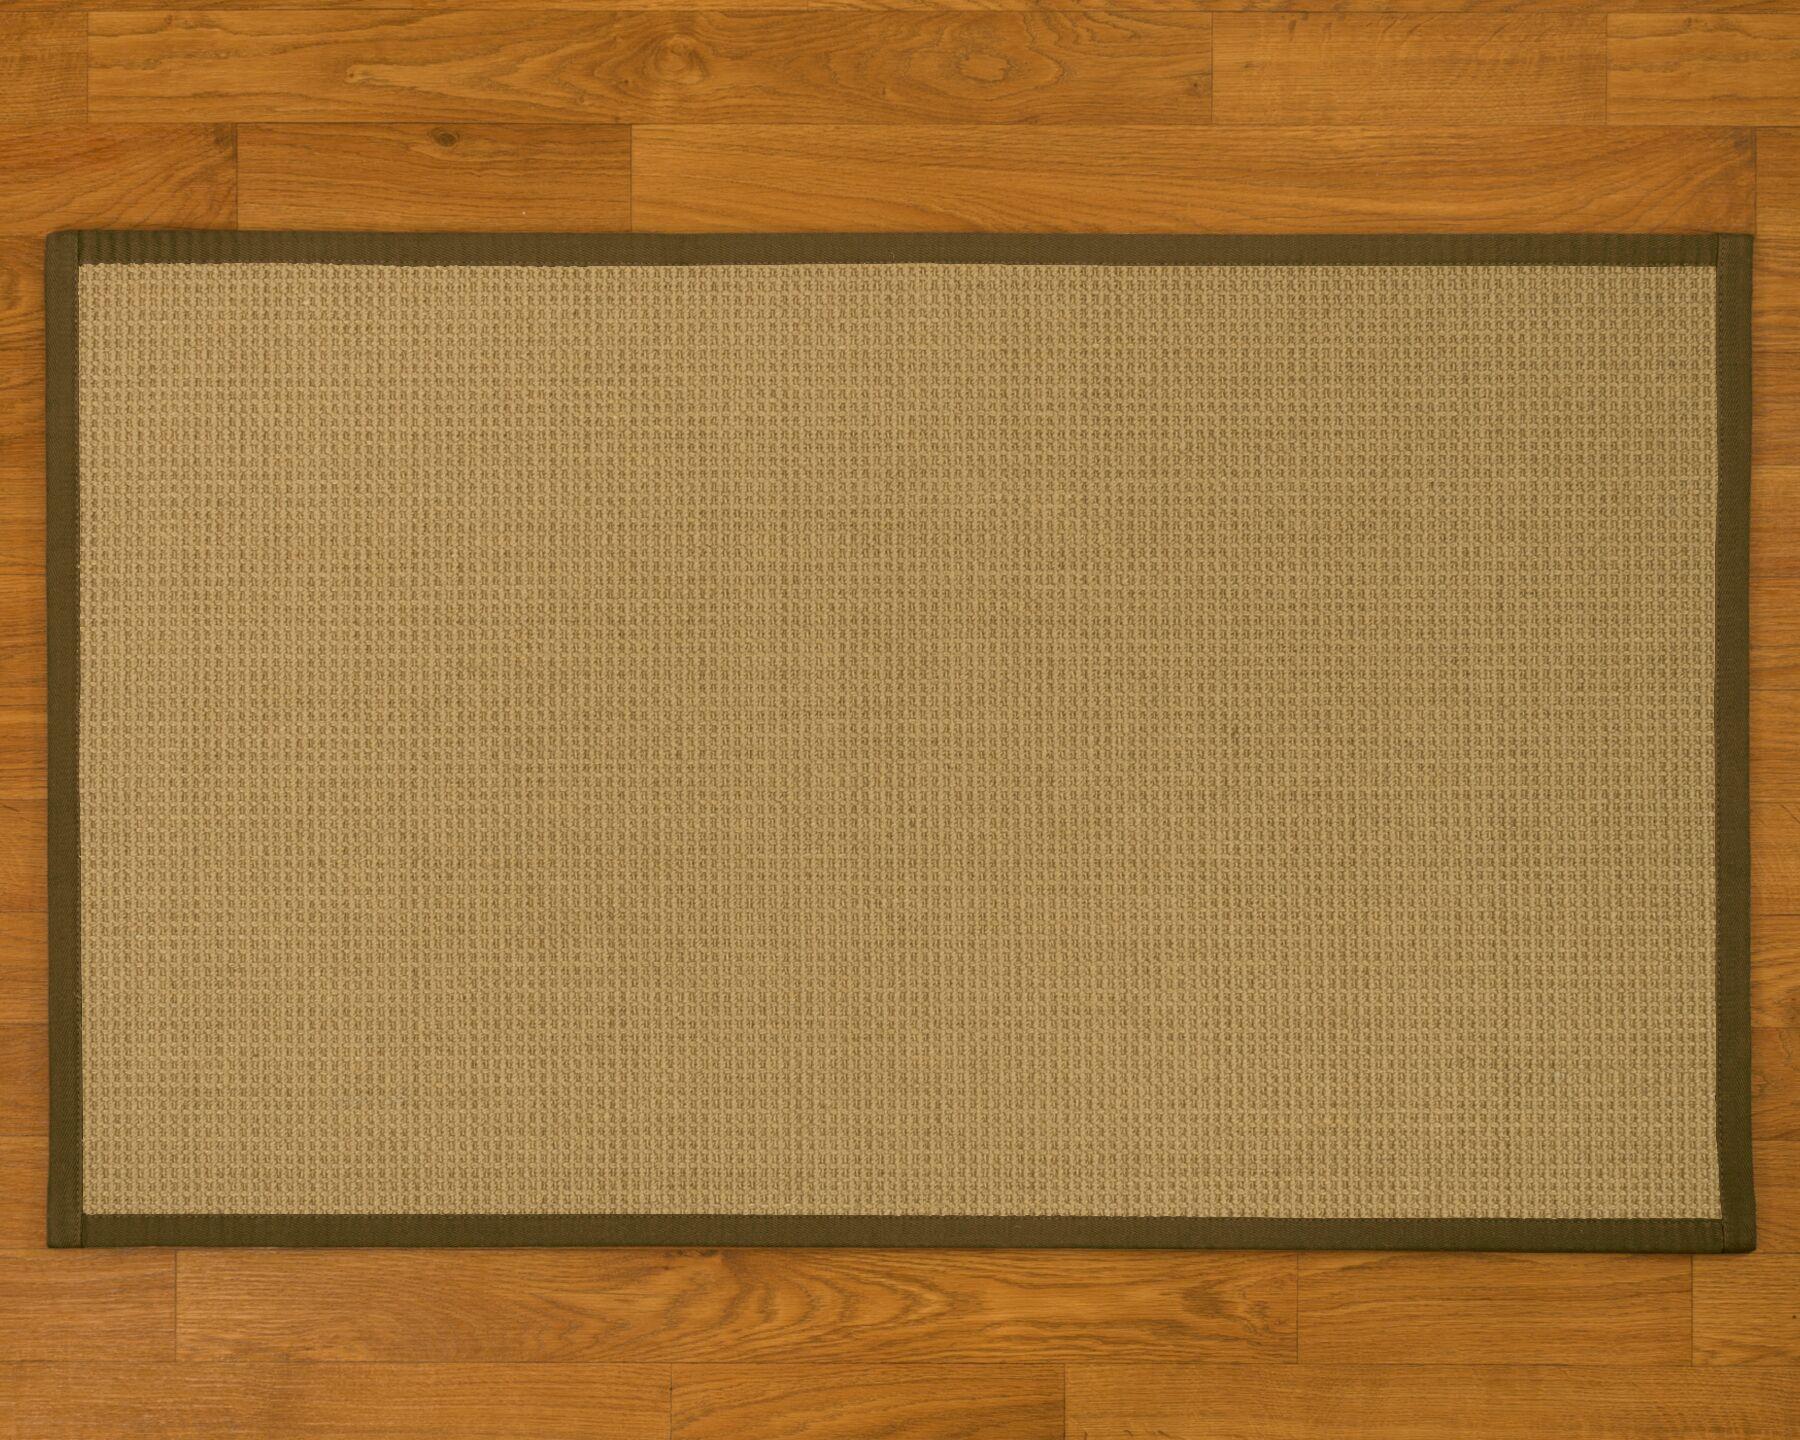 Jacobs Hand-Woven Malt Area Rug Rug Size: Rectangle 9' x 12'